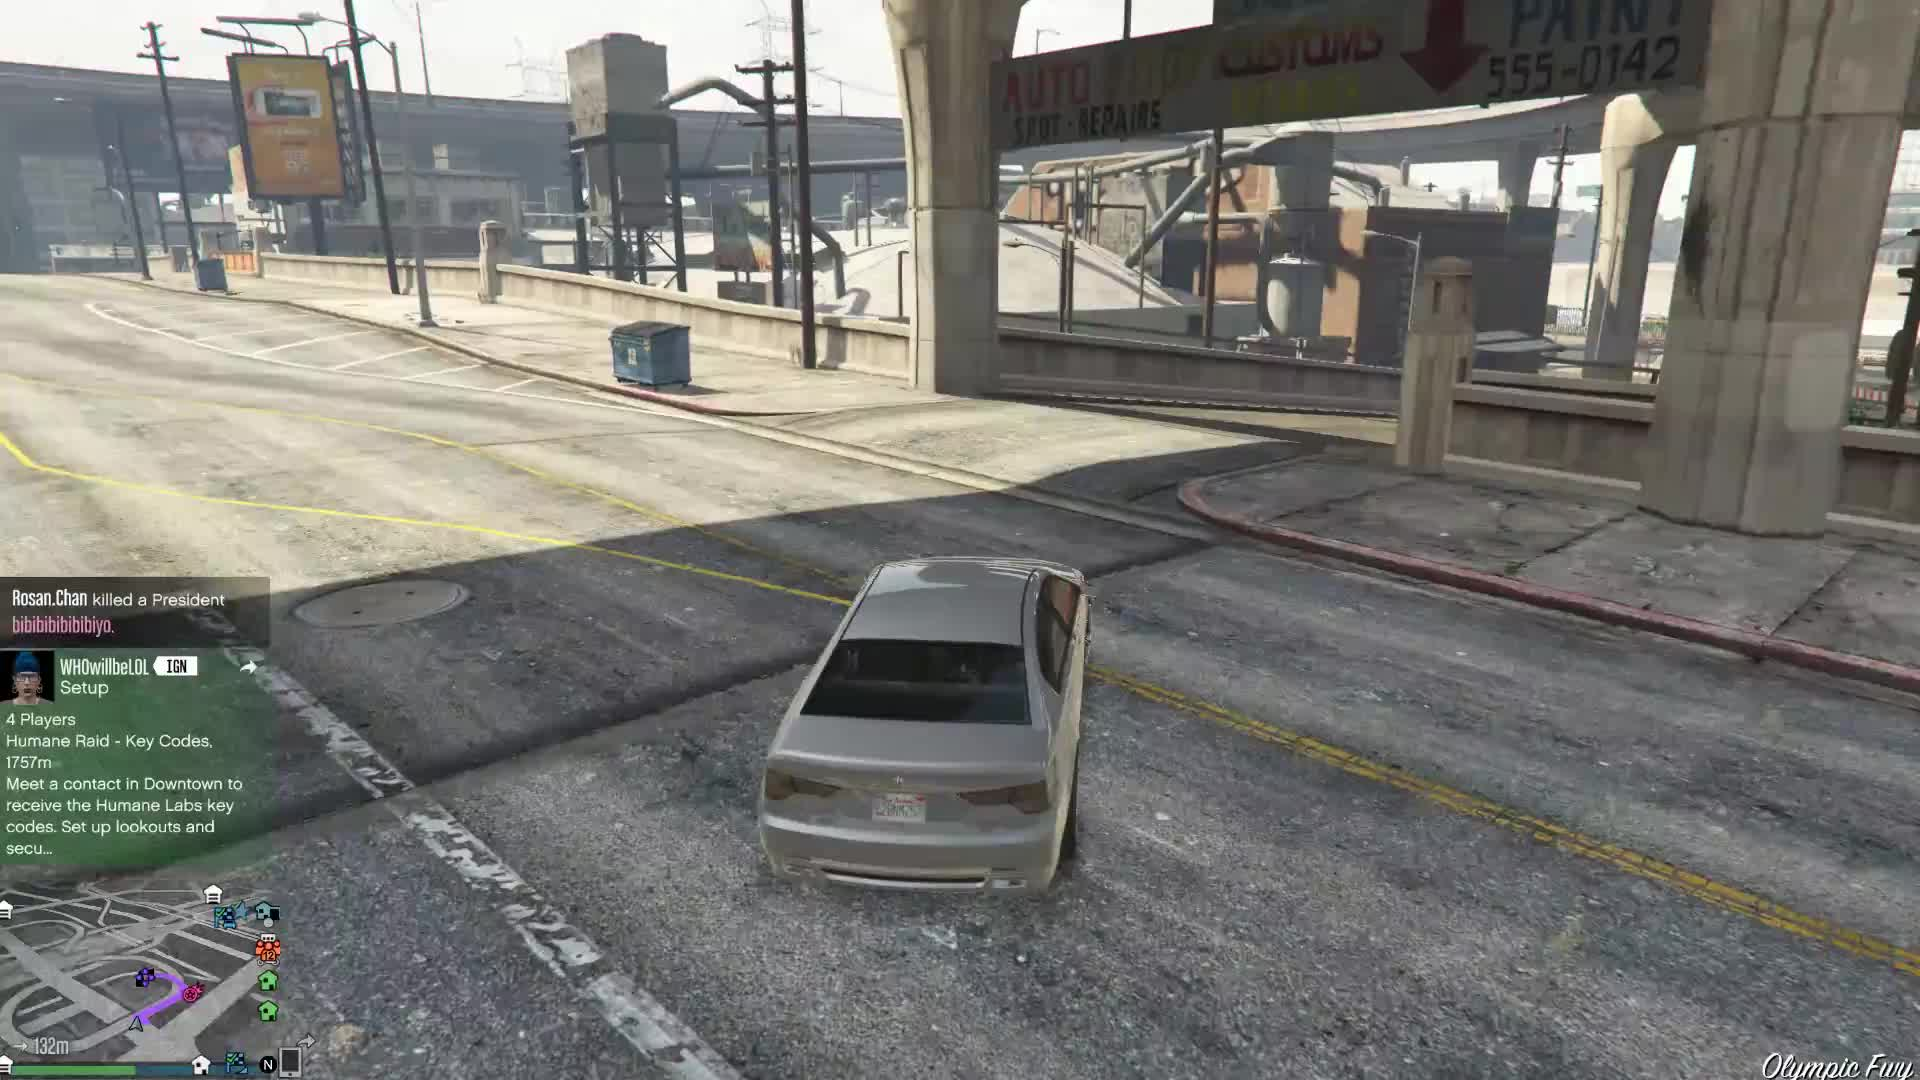 gtaonline, Car-llision spin-a-roo GIFs